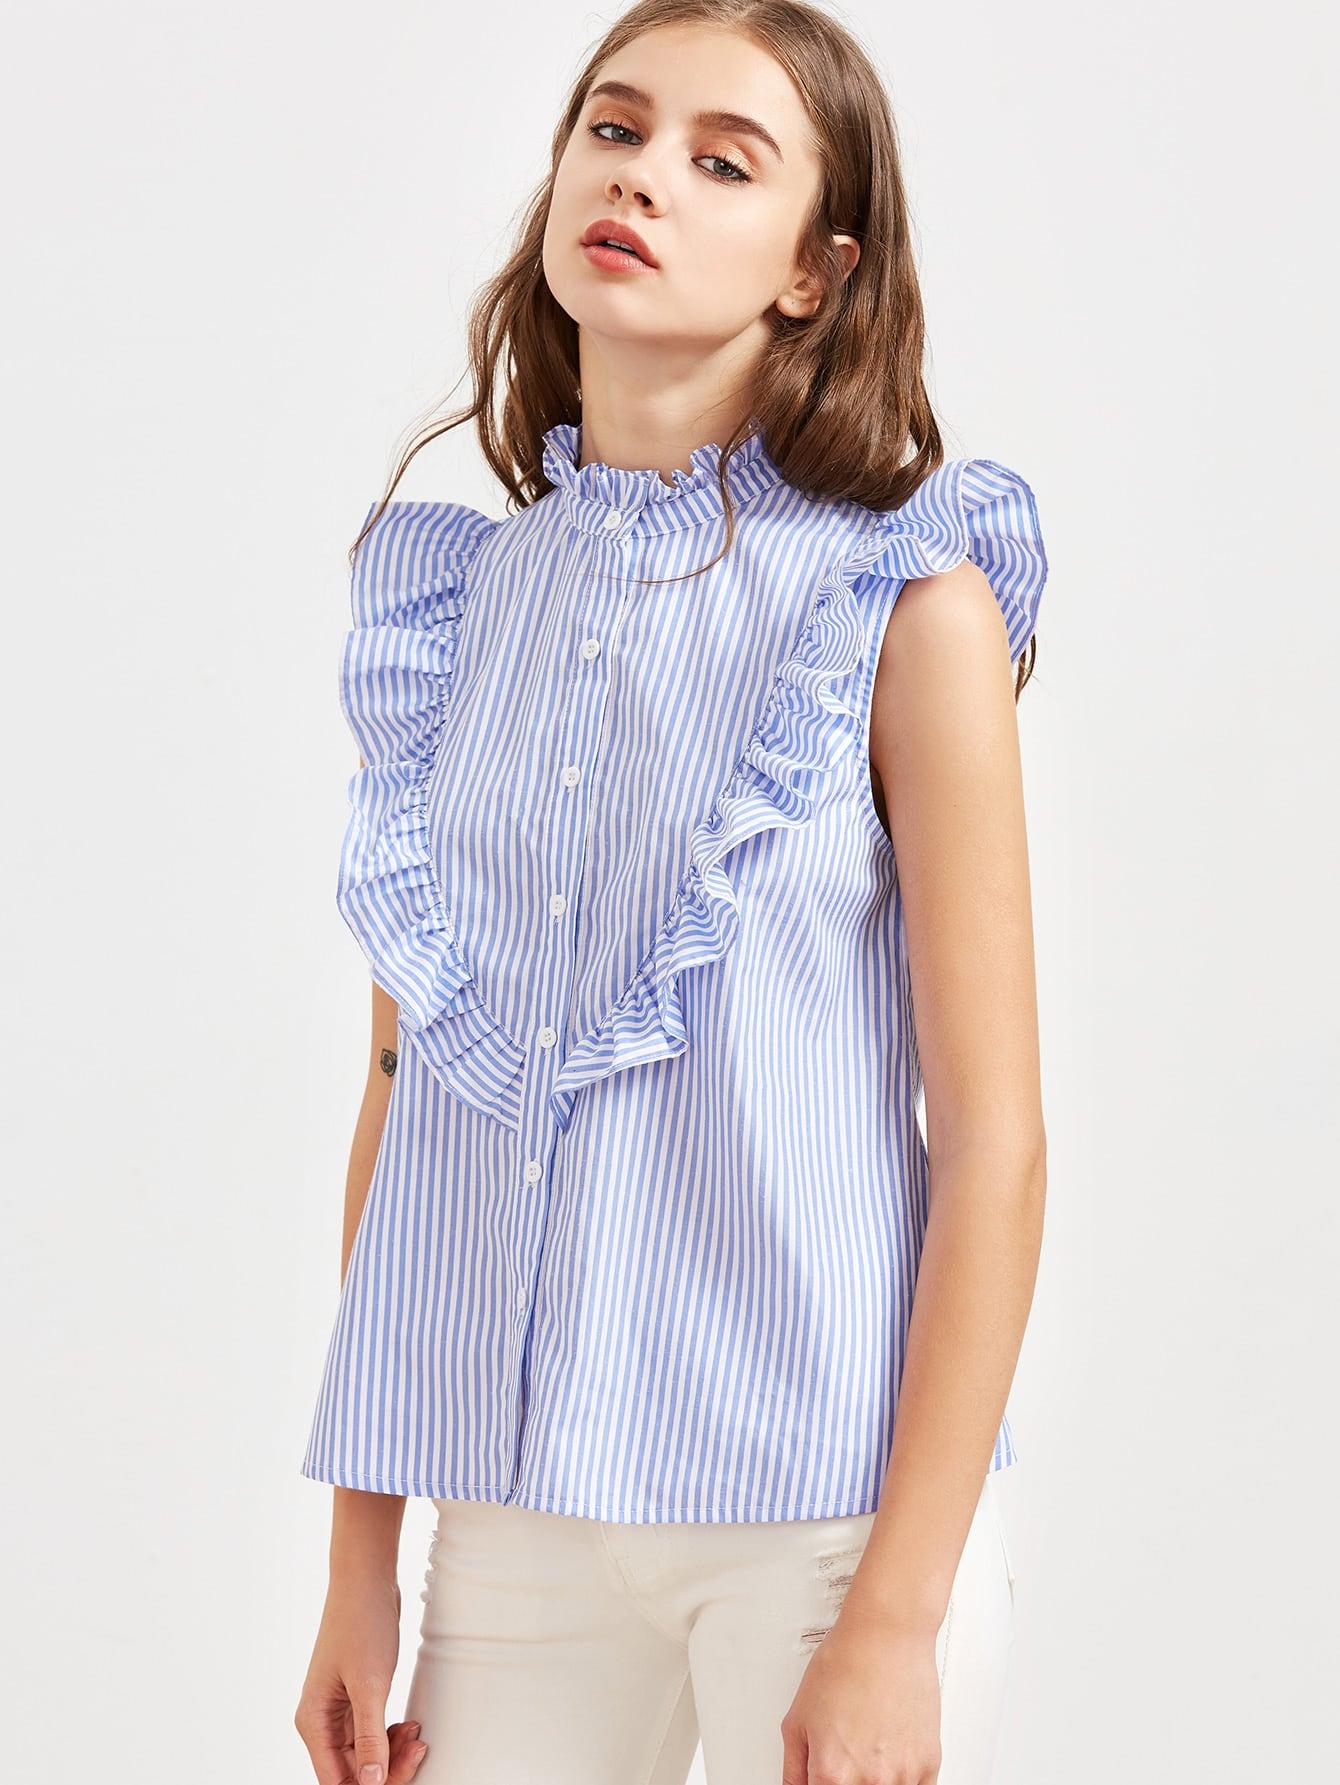 Blue Striped Ruffle Detail Sleeveless Blouse blouse170213712